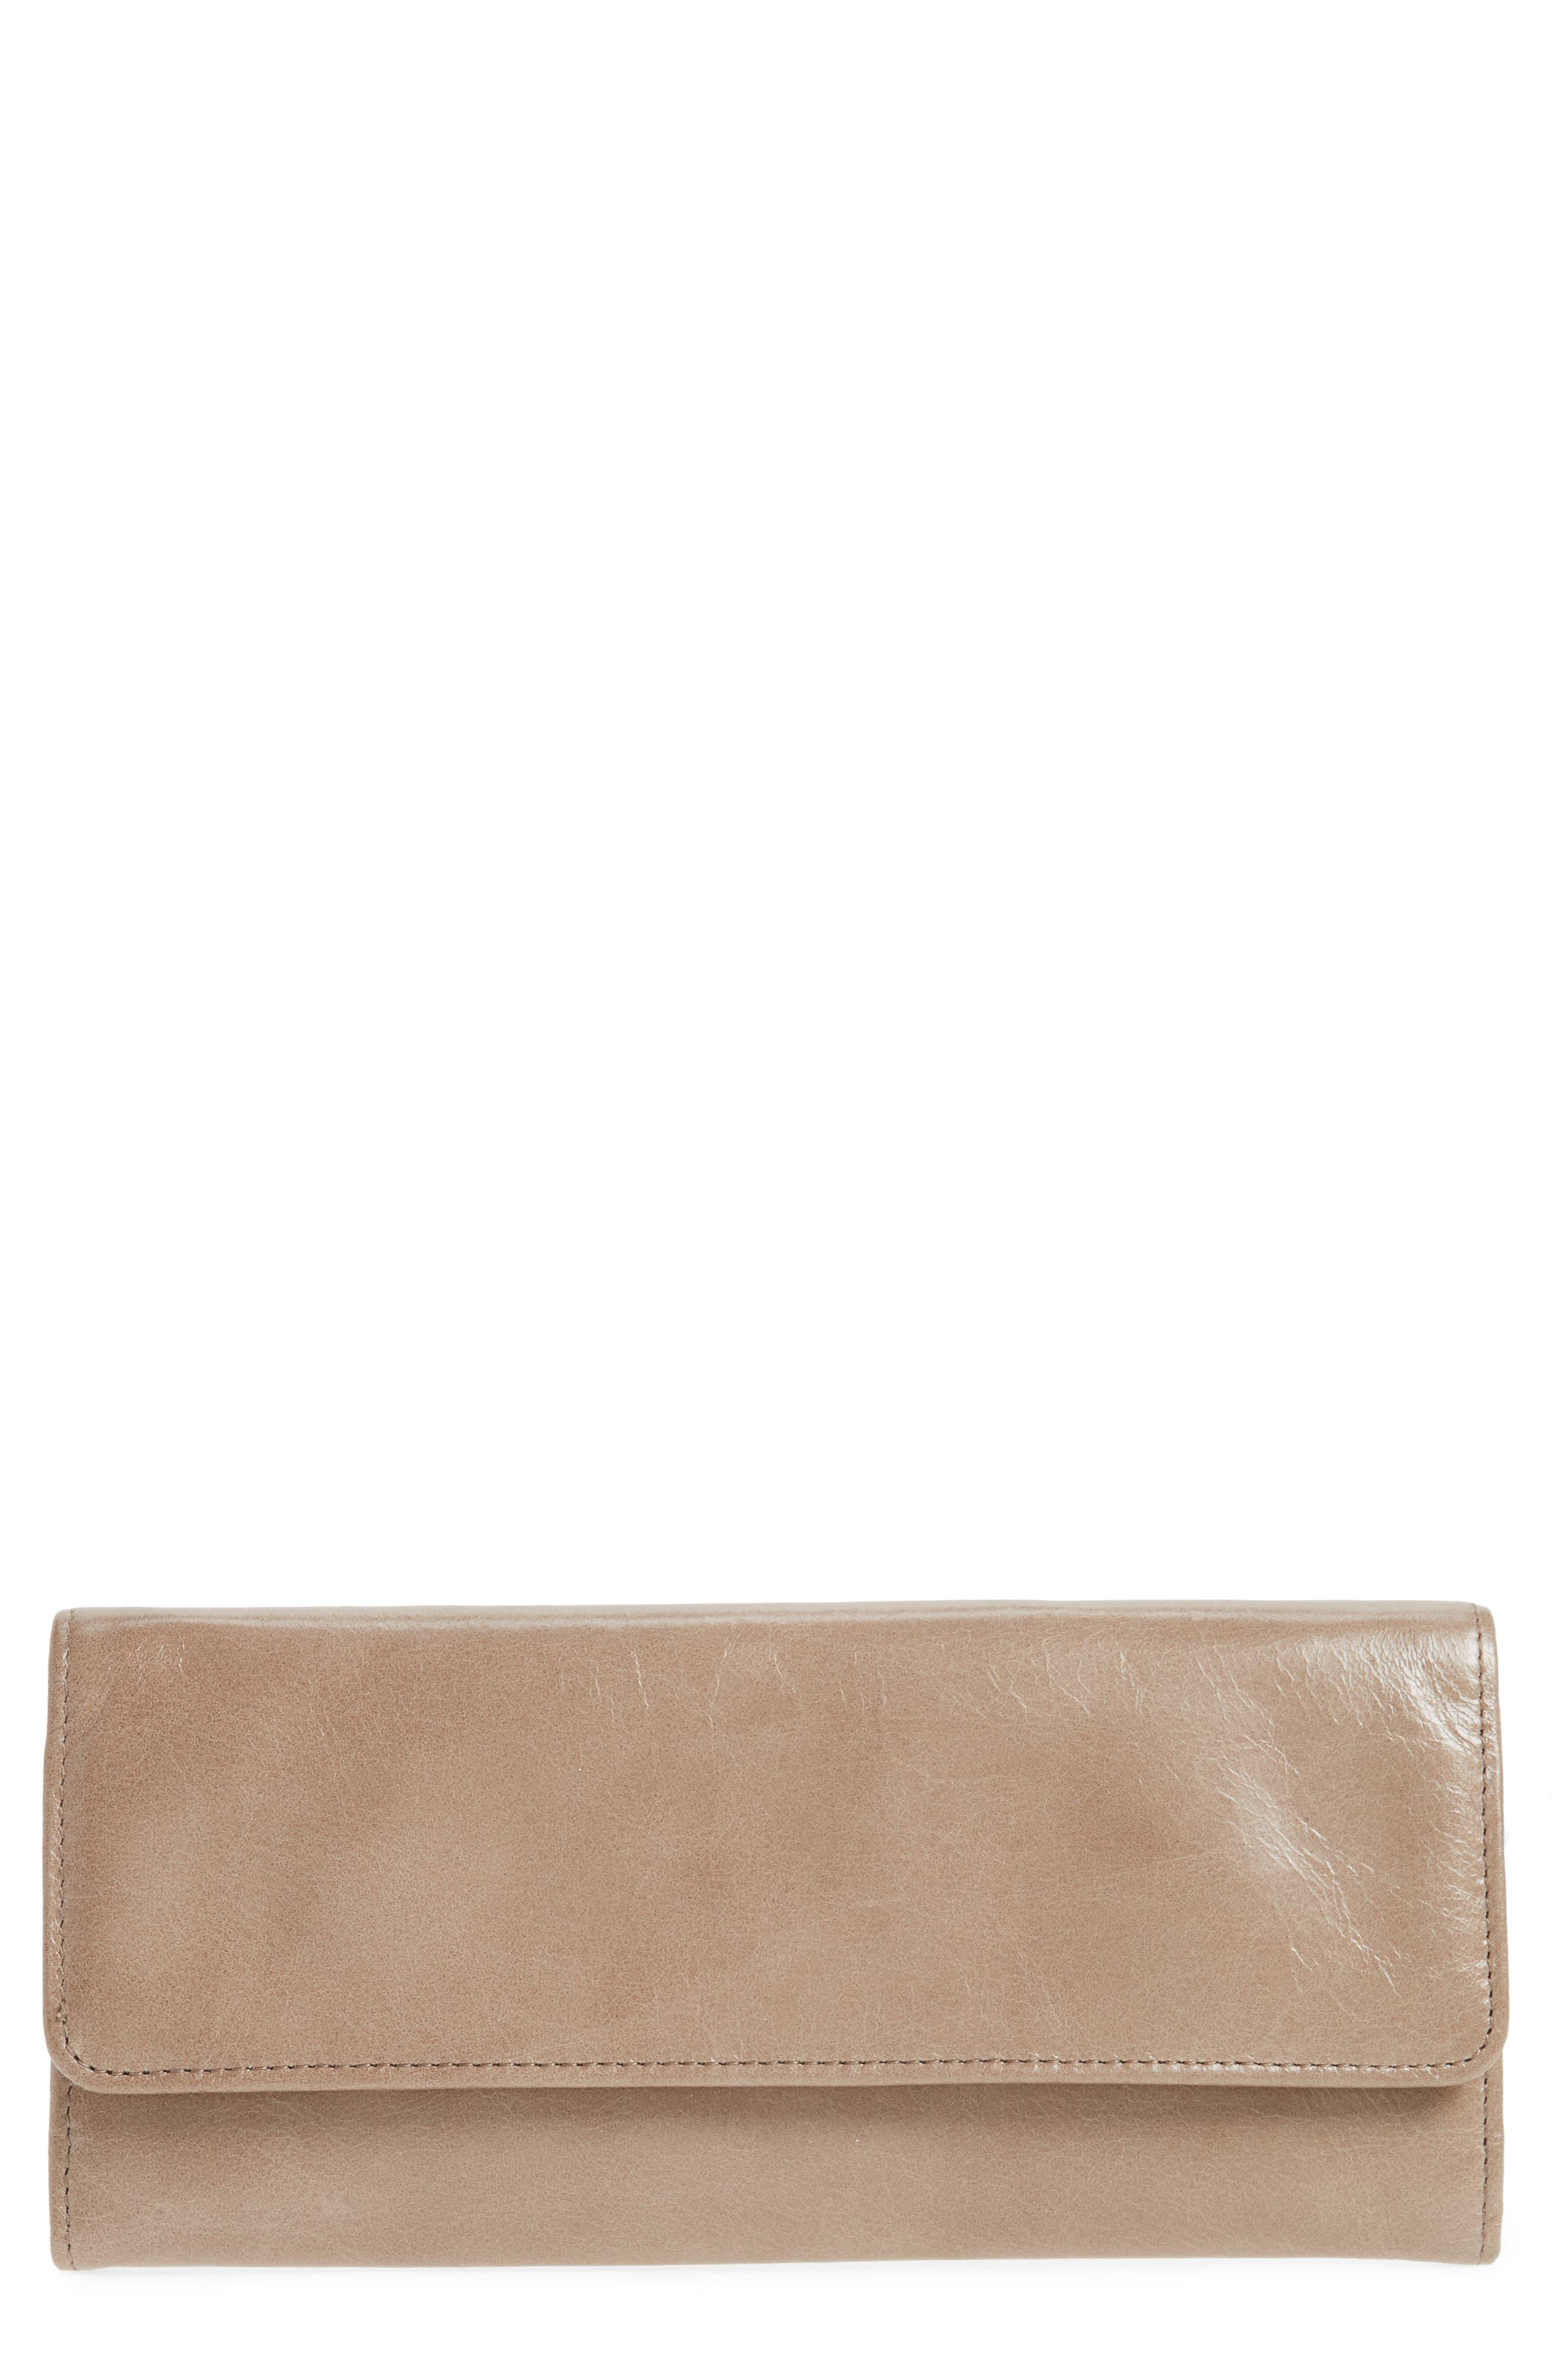 'Sadie' Leather Wallet,                             Main thumbnail 1, color,